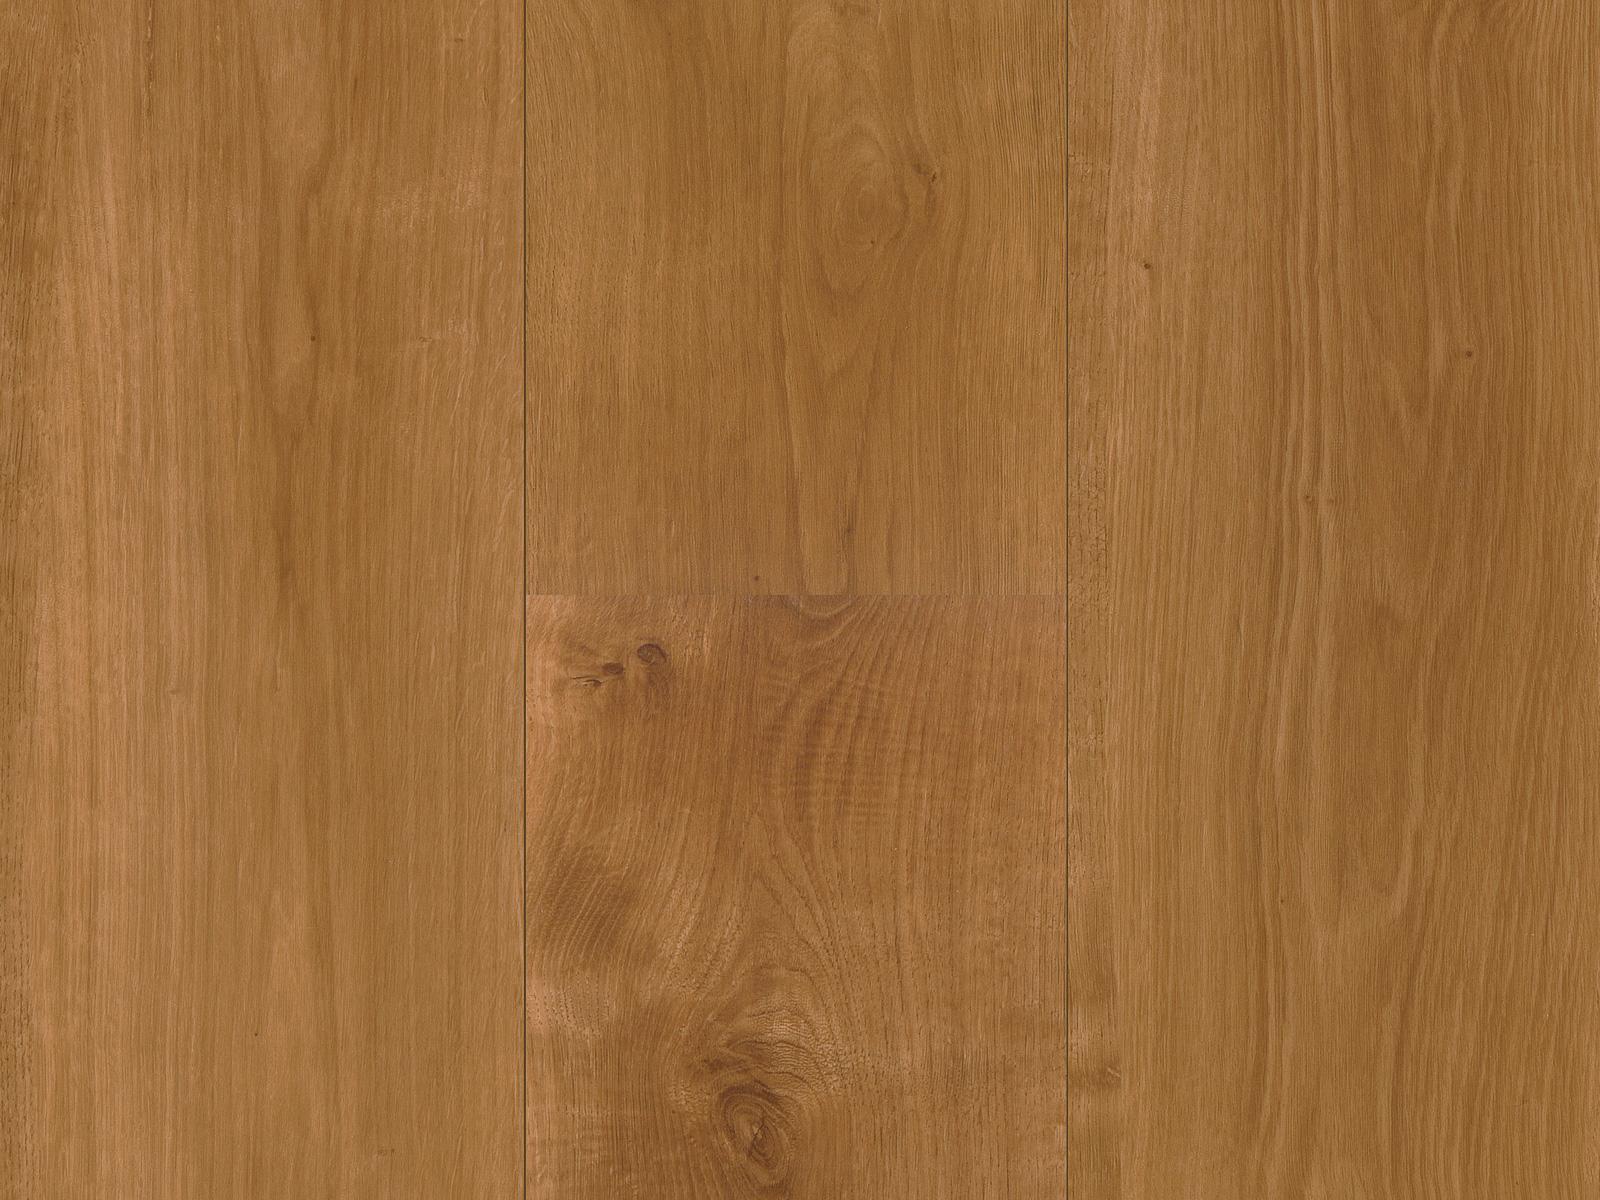 vinyl-natural-oak-swatch